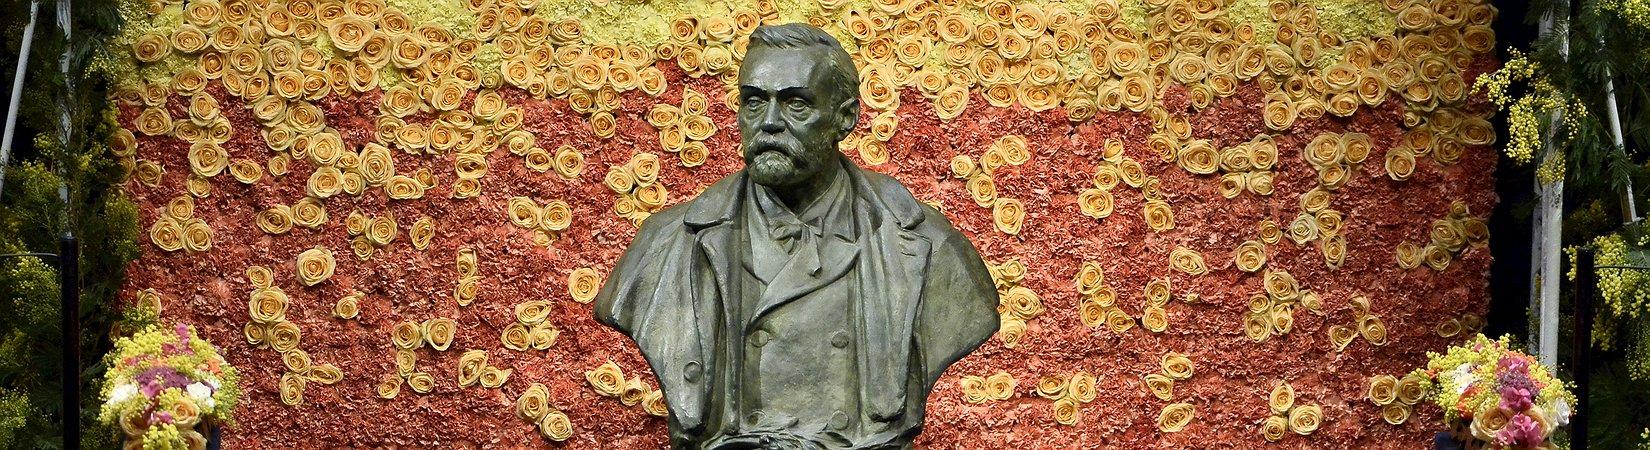 Cerimónia de entrega dos Prémios Nobel tem lugar este sábado